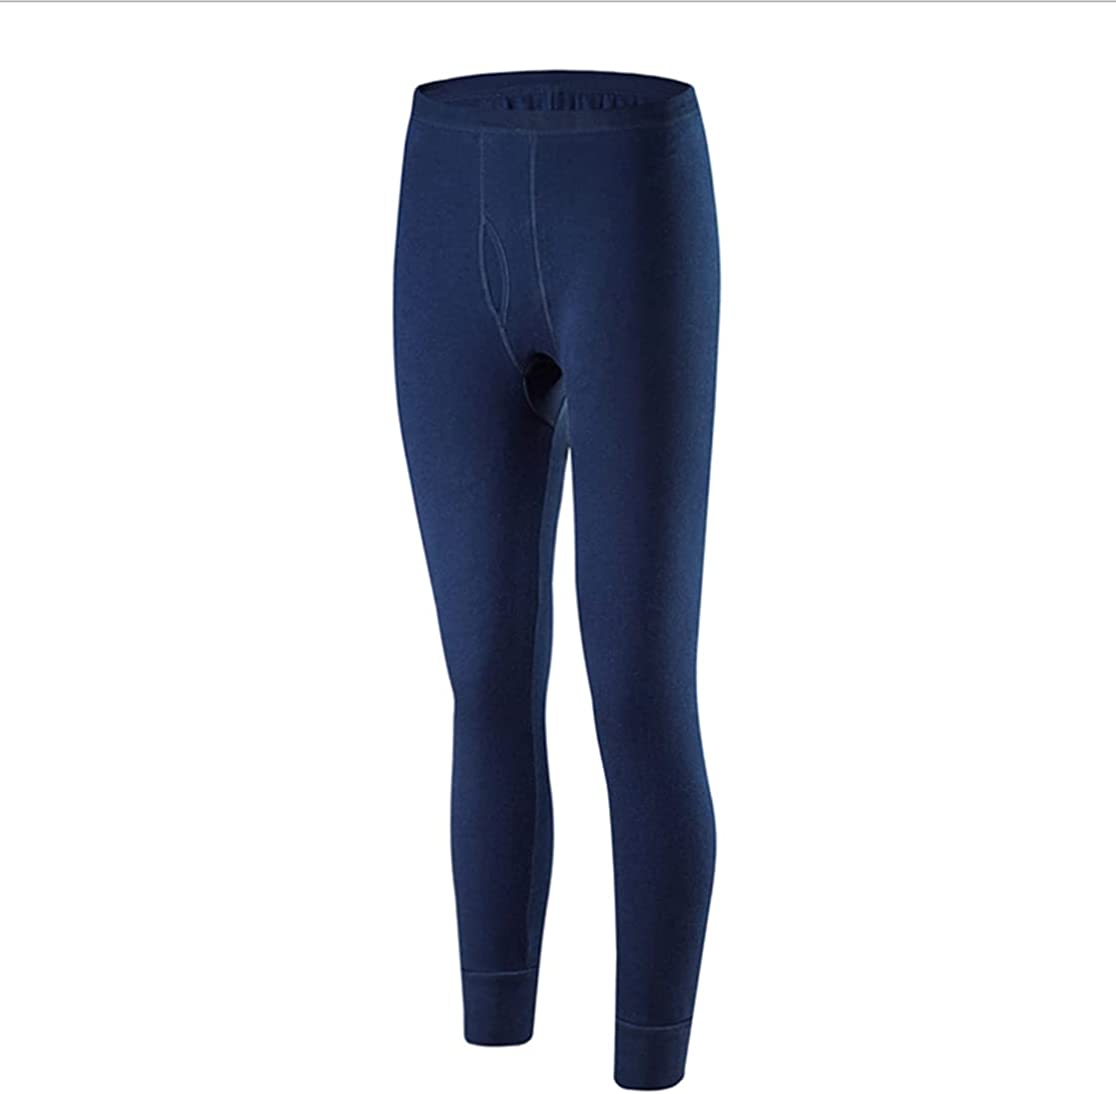 Wenaca Men's Ultra Soft Thermal Underwear Bottom Tight Long Leggings